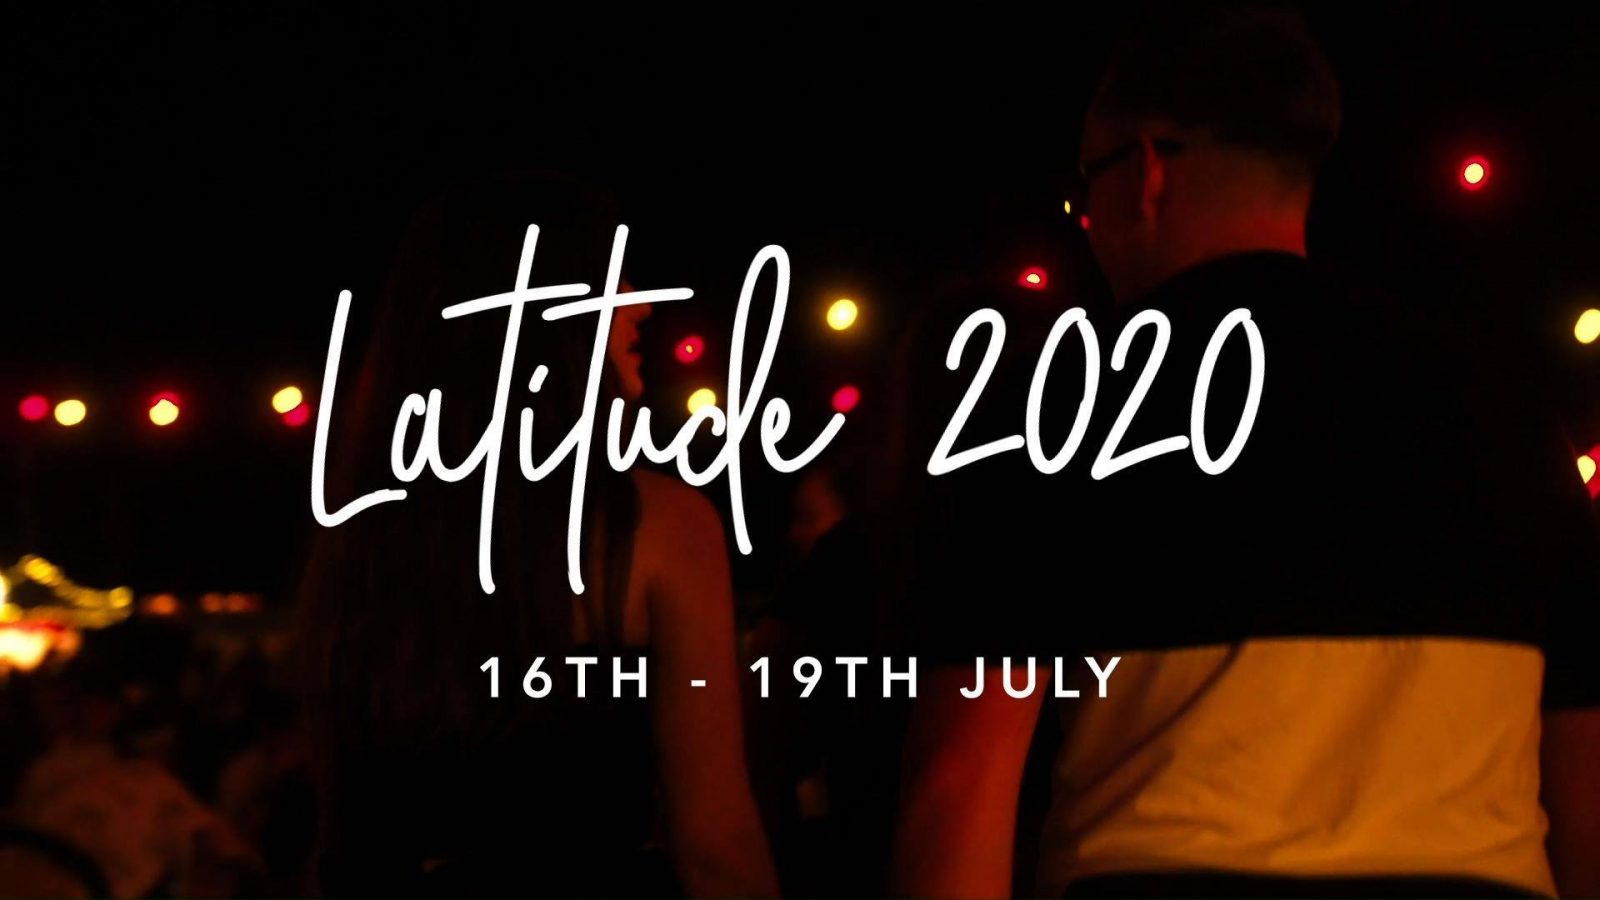 Latitude 2020 tickets on sale now